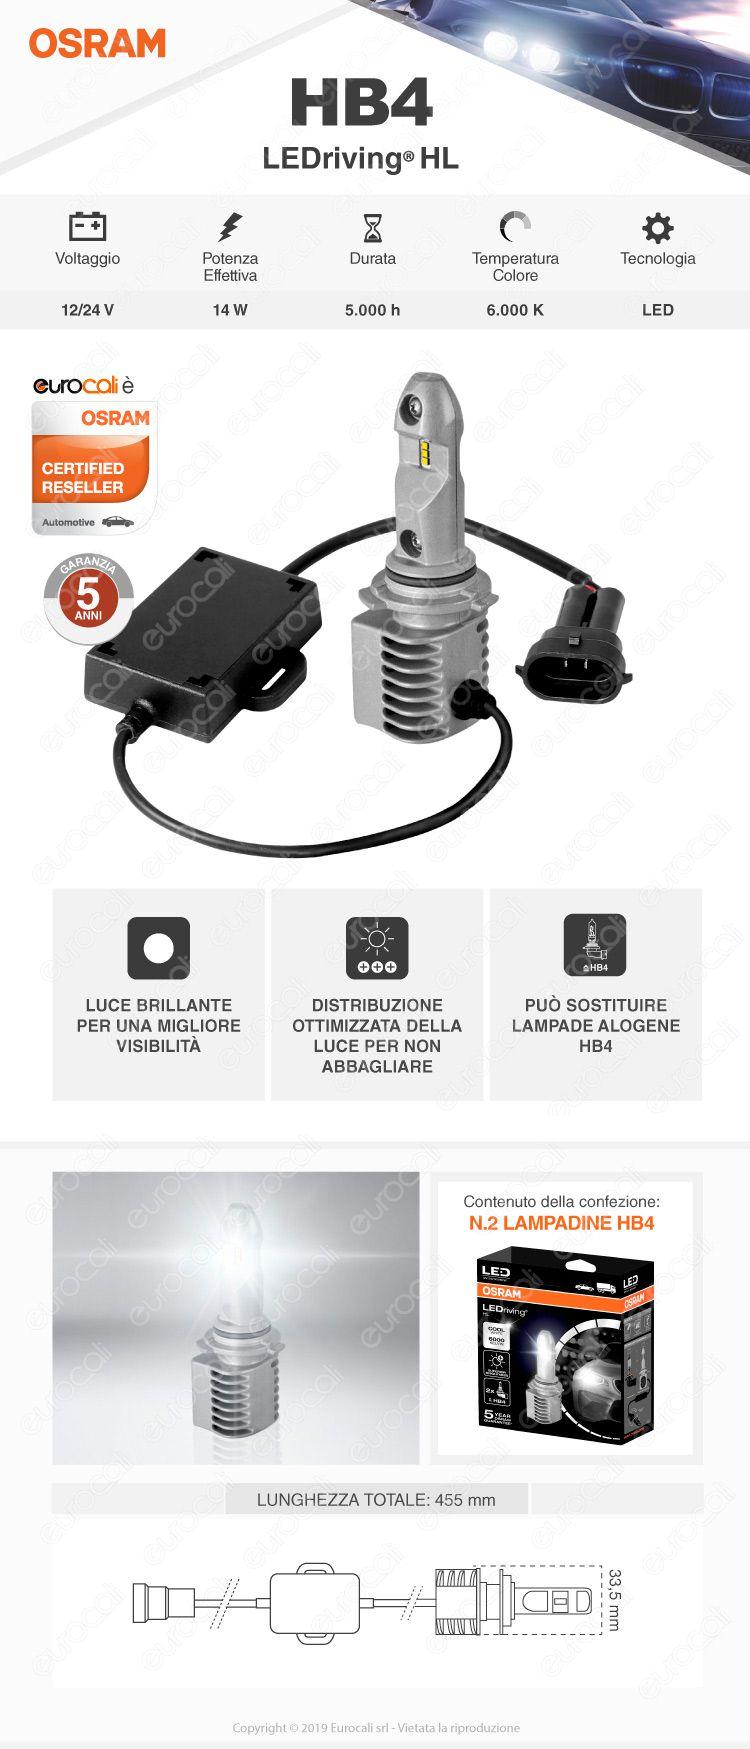 2 Lampadine HB4 Osram LEDriving HL